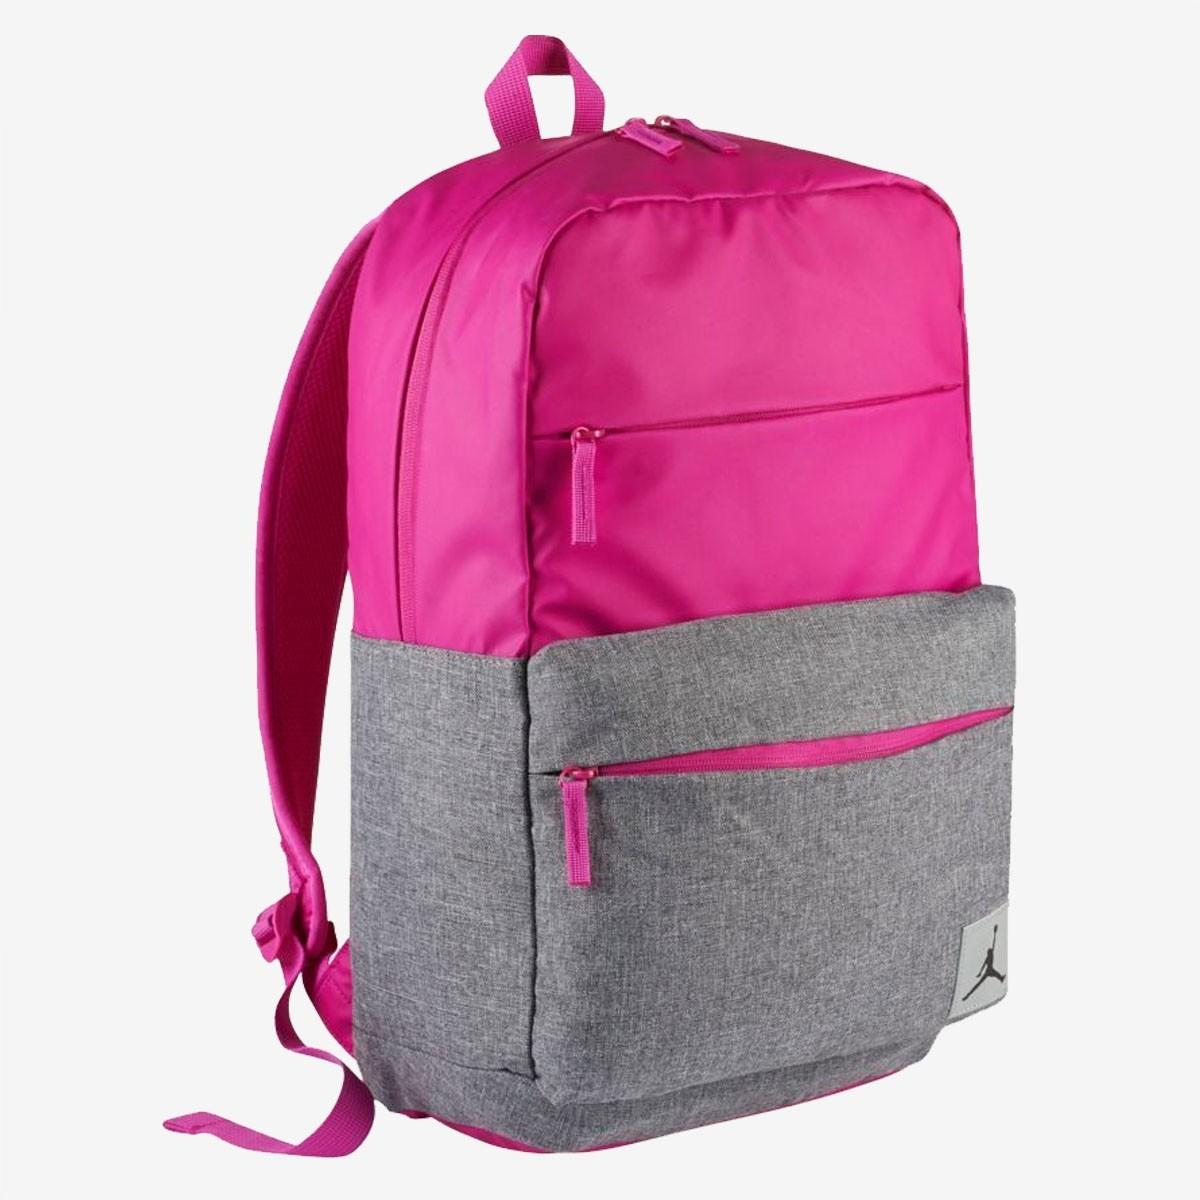 Jordan Pivot Backpack 'Fucsia'